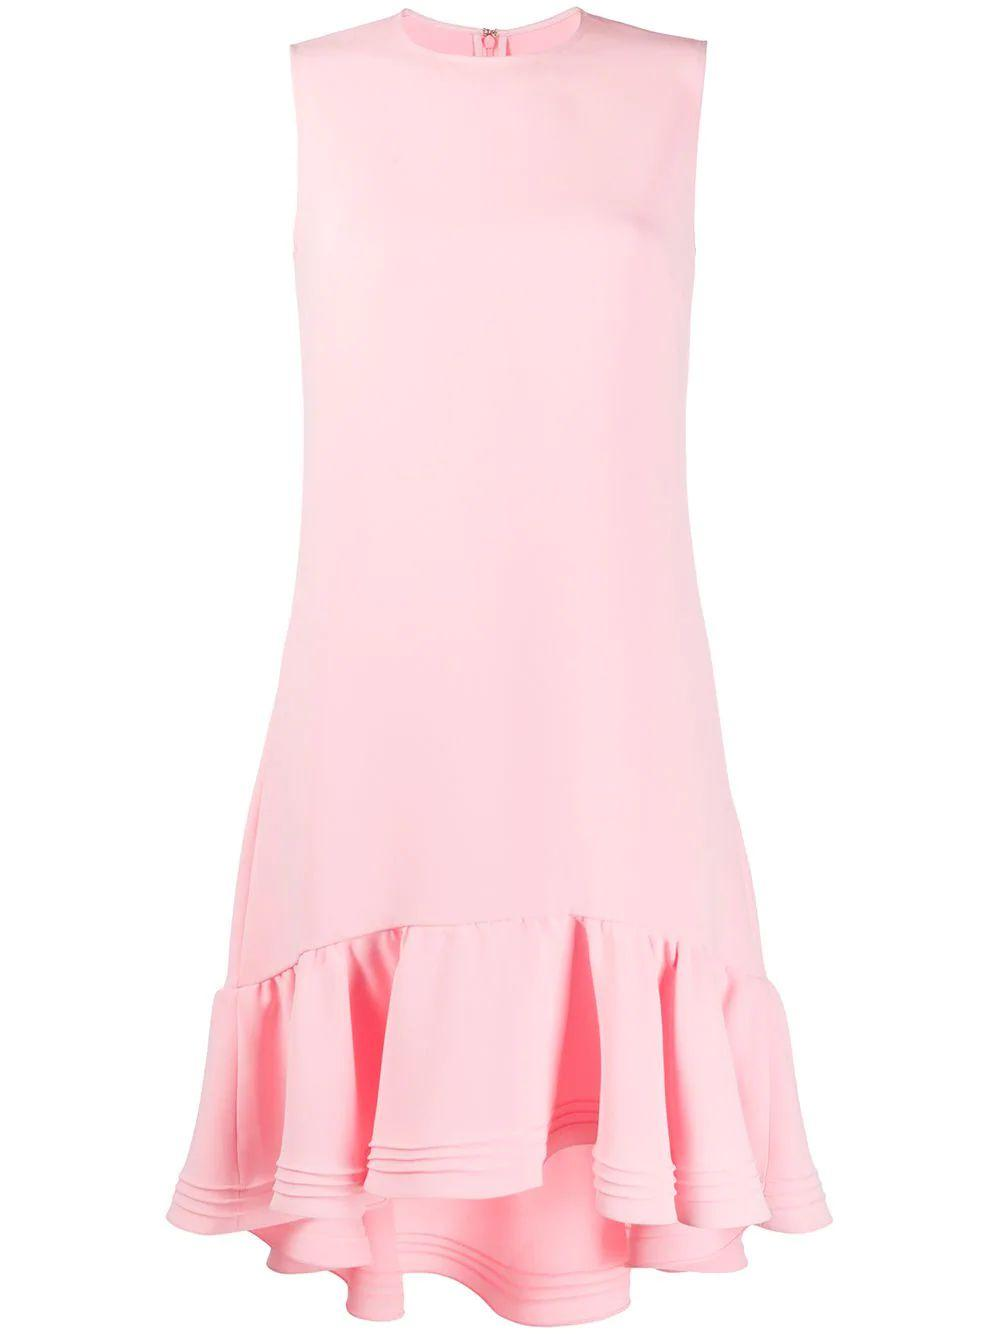 Pintuck Flounce Hem Shift Dress Item # 2320WDR001720B